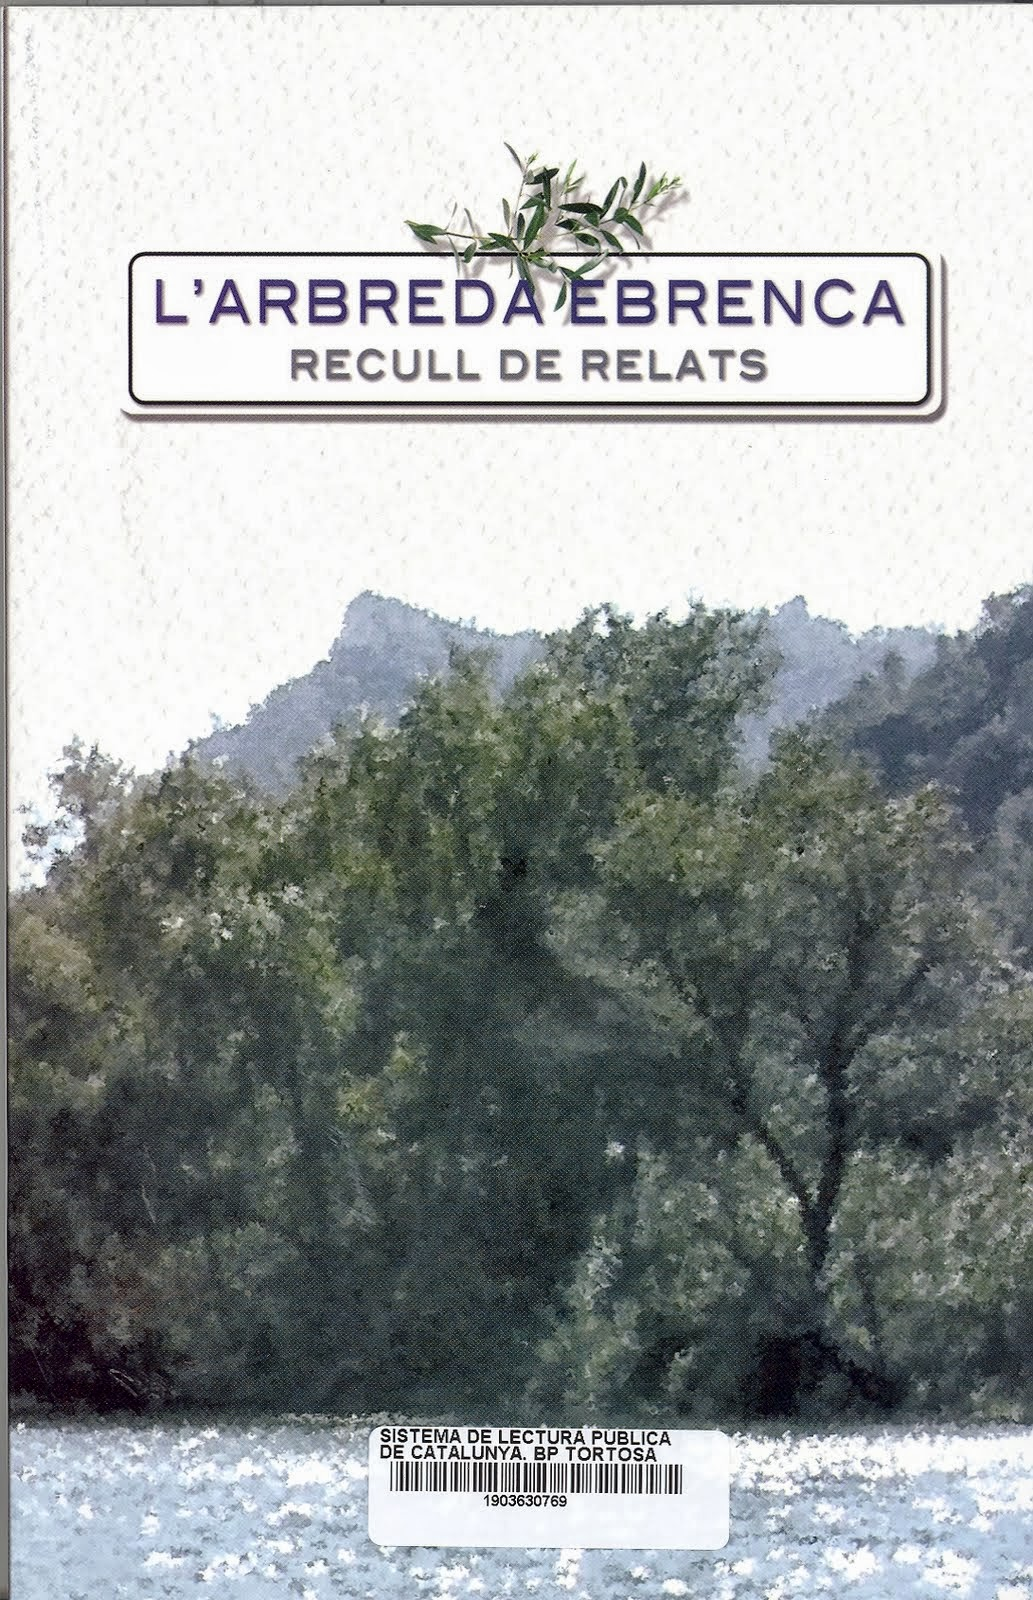 ARBREDA EBRENCA, 2010